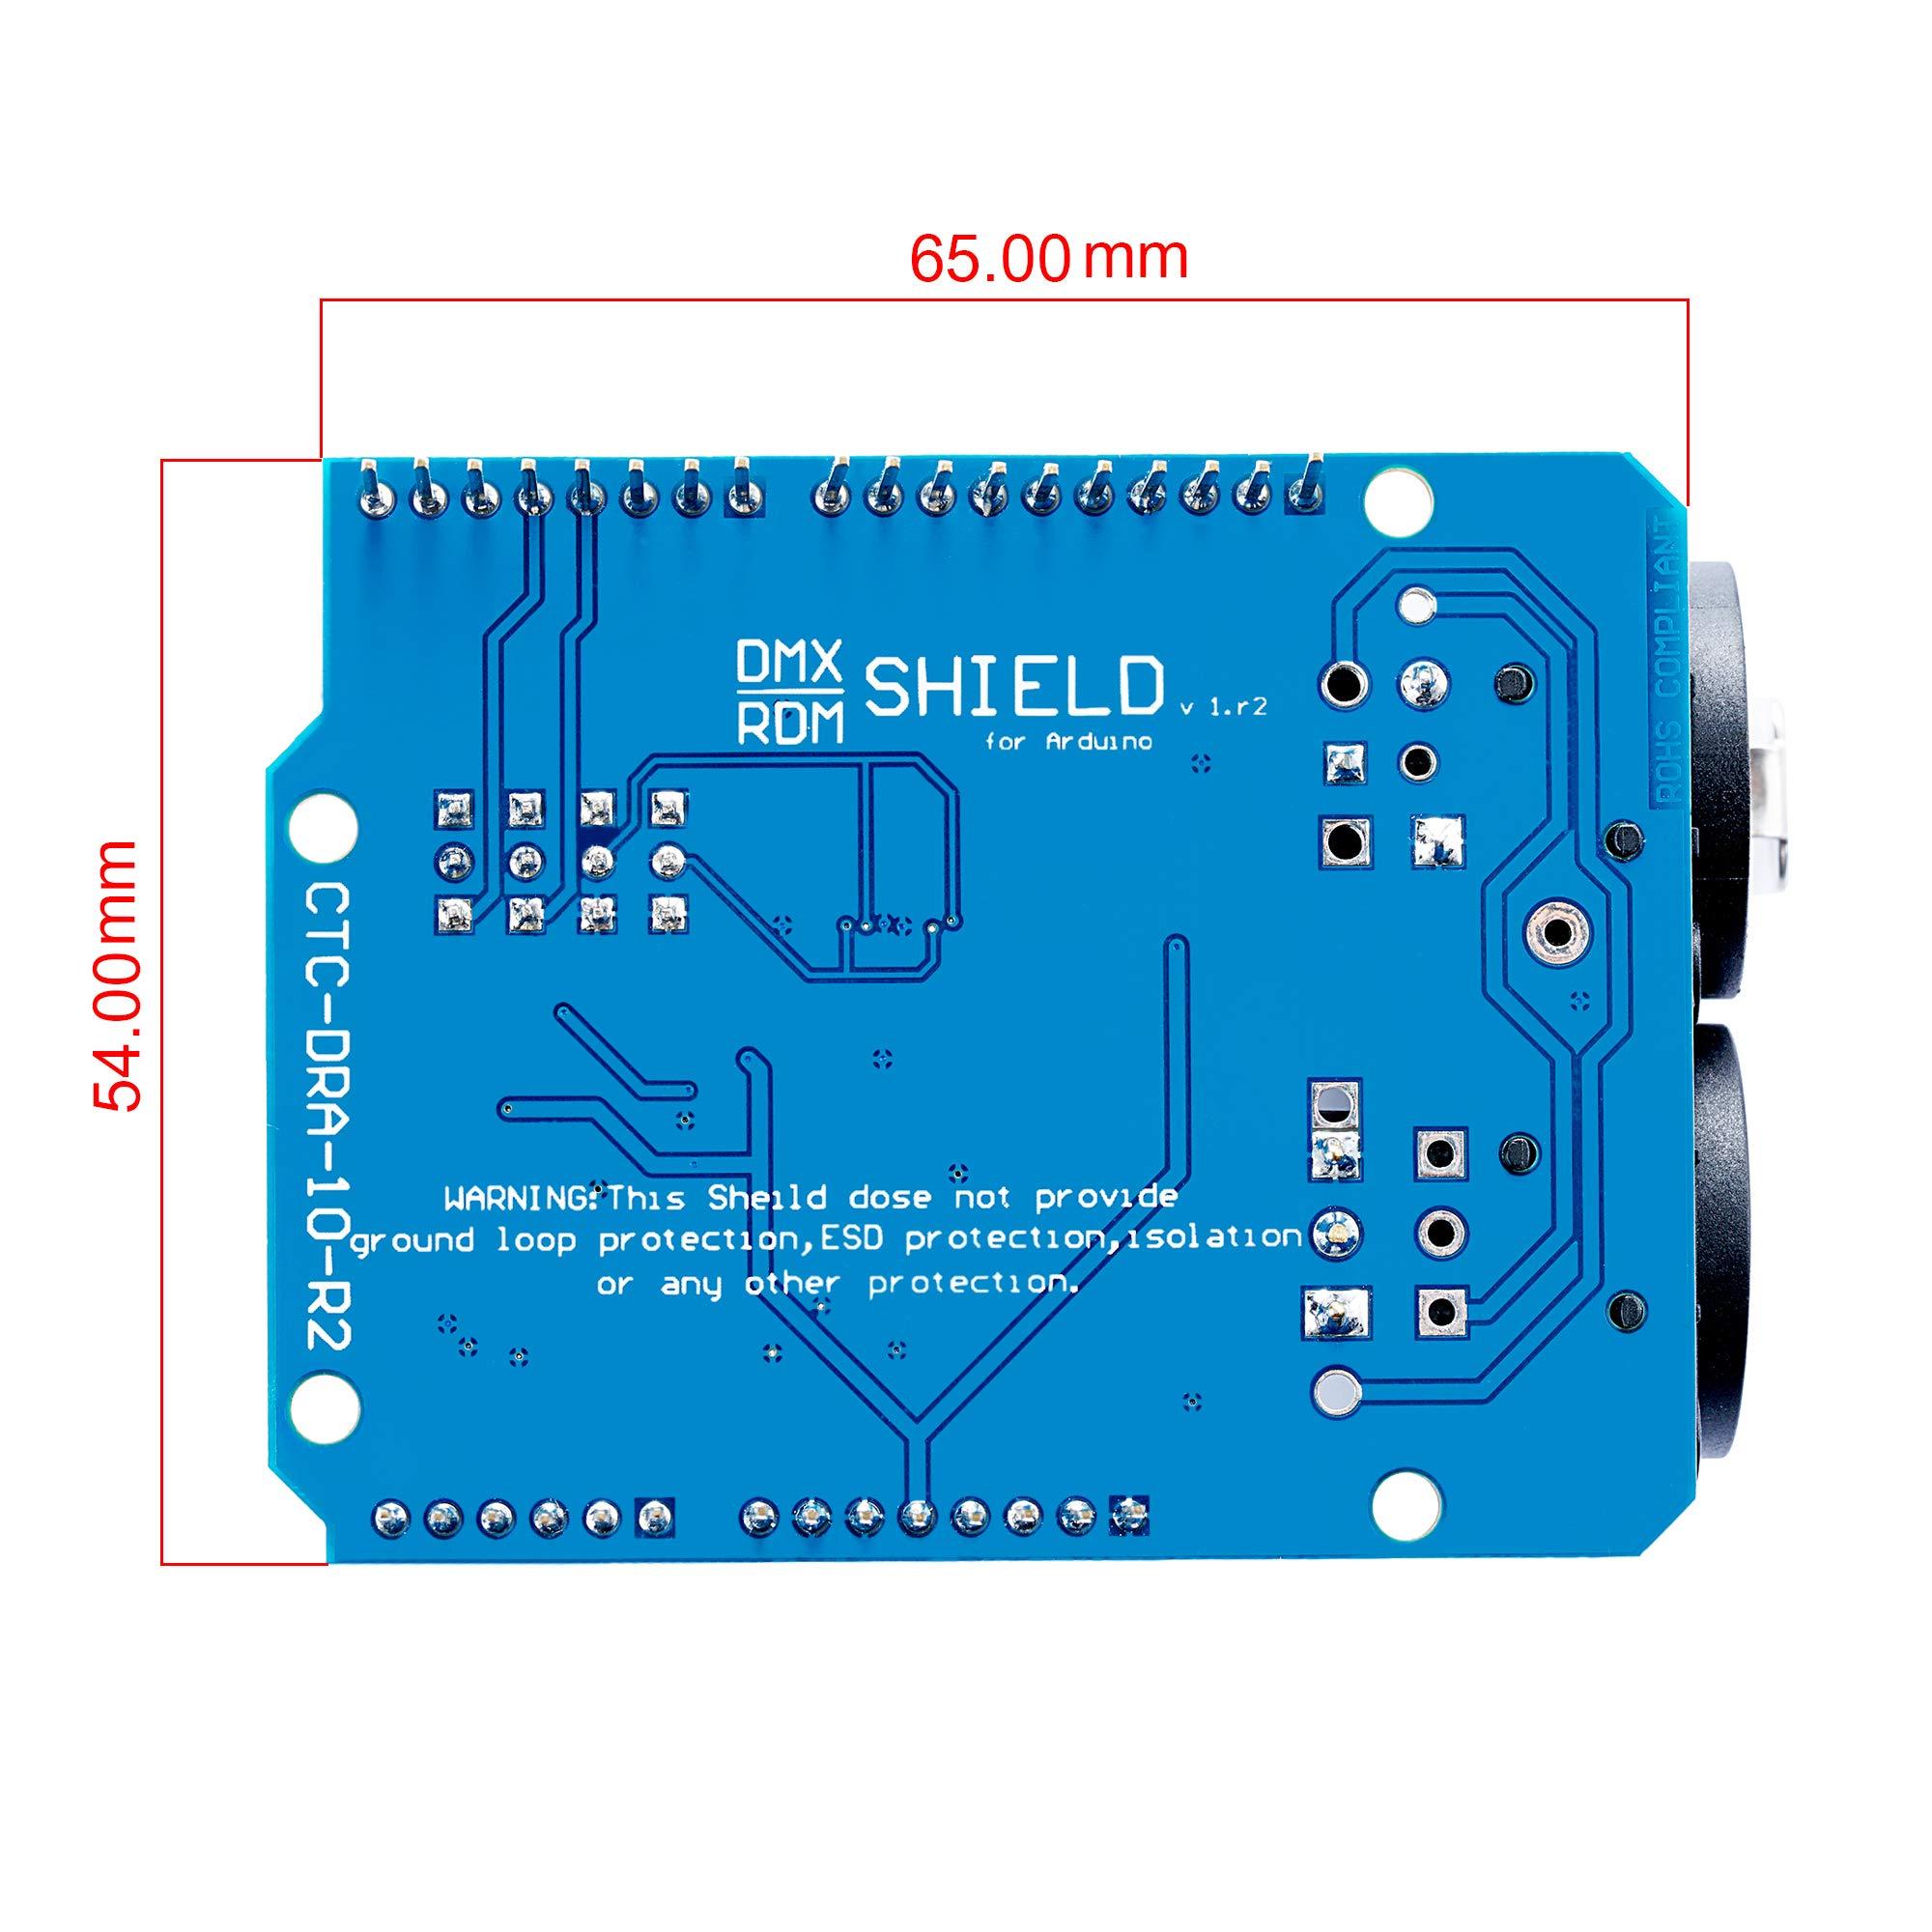 DMX Shield MAX485 Chipset for Arduino (RDM Capable)@CQRobot